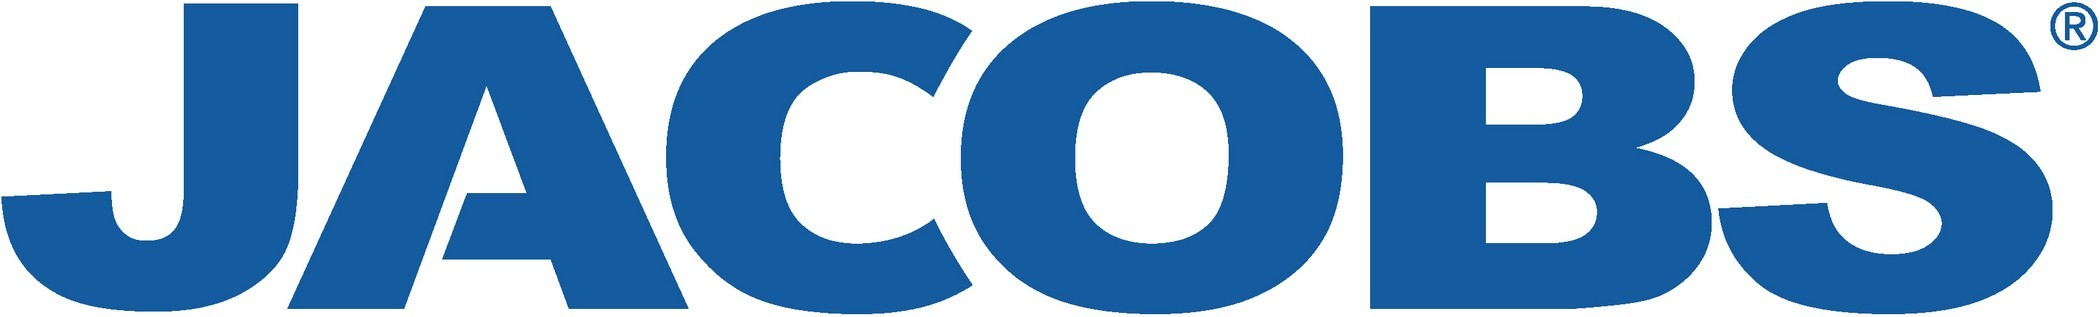 Jacobs-Engineering-Logo